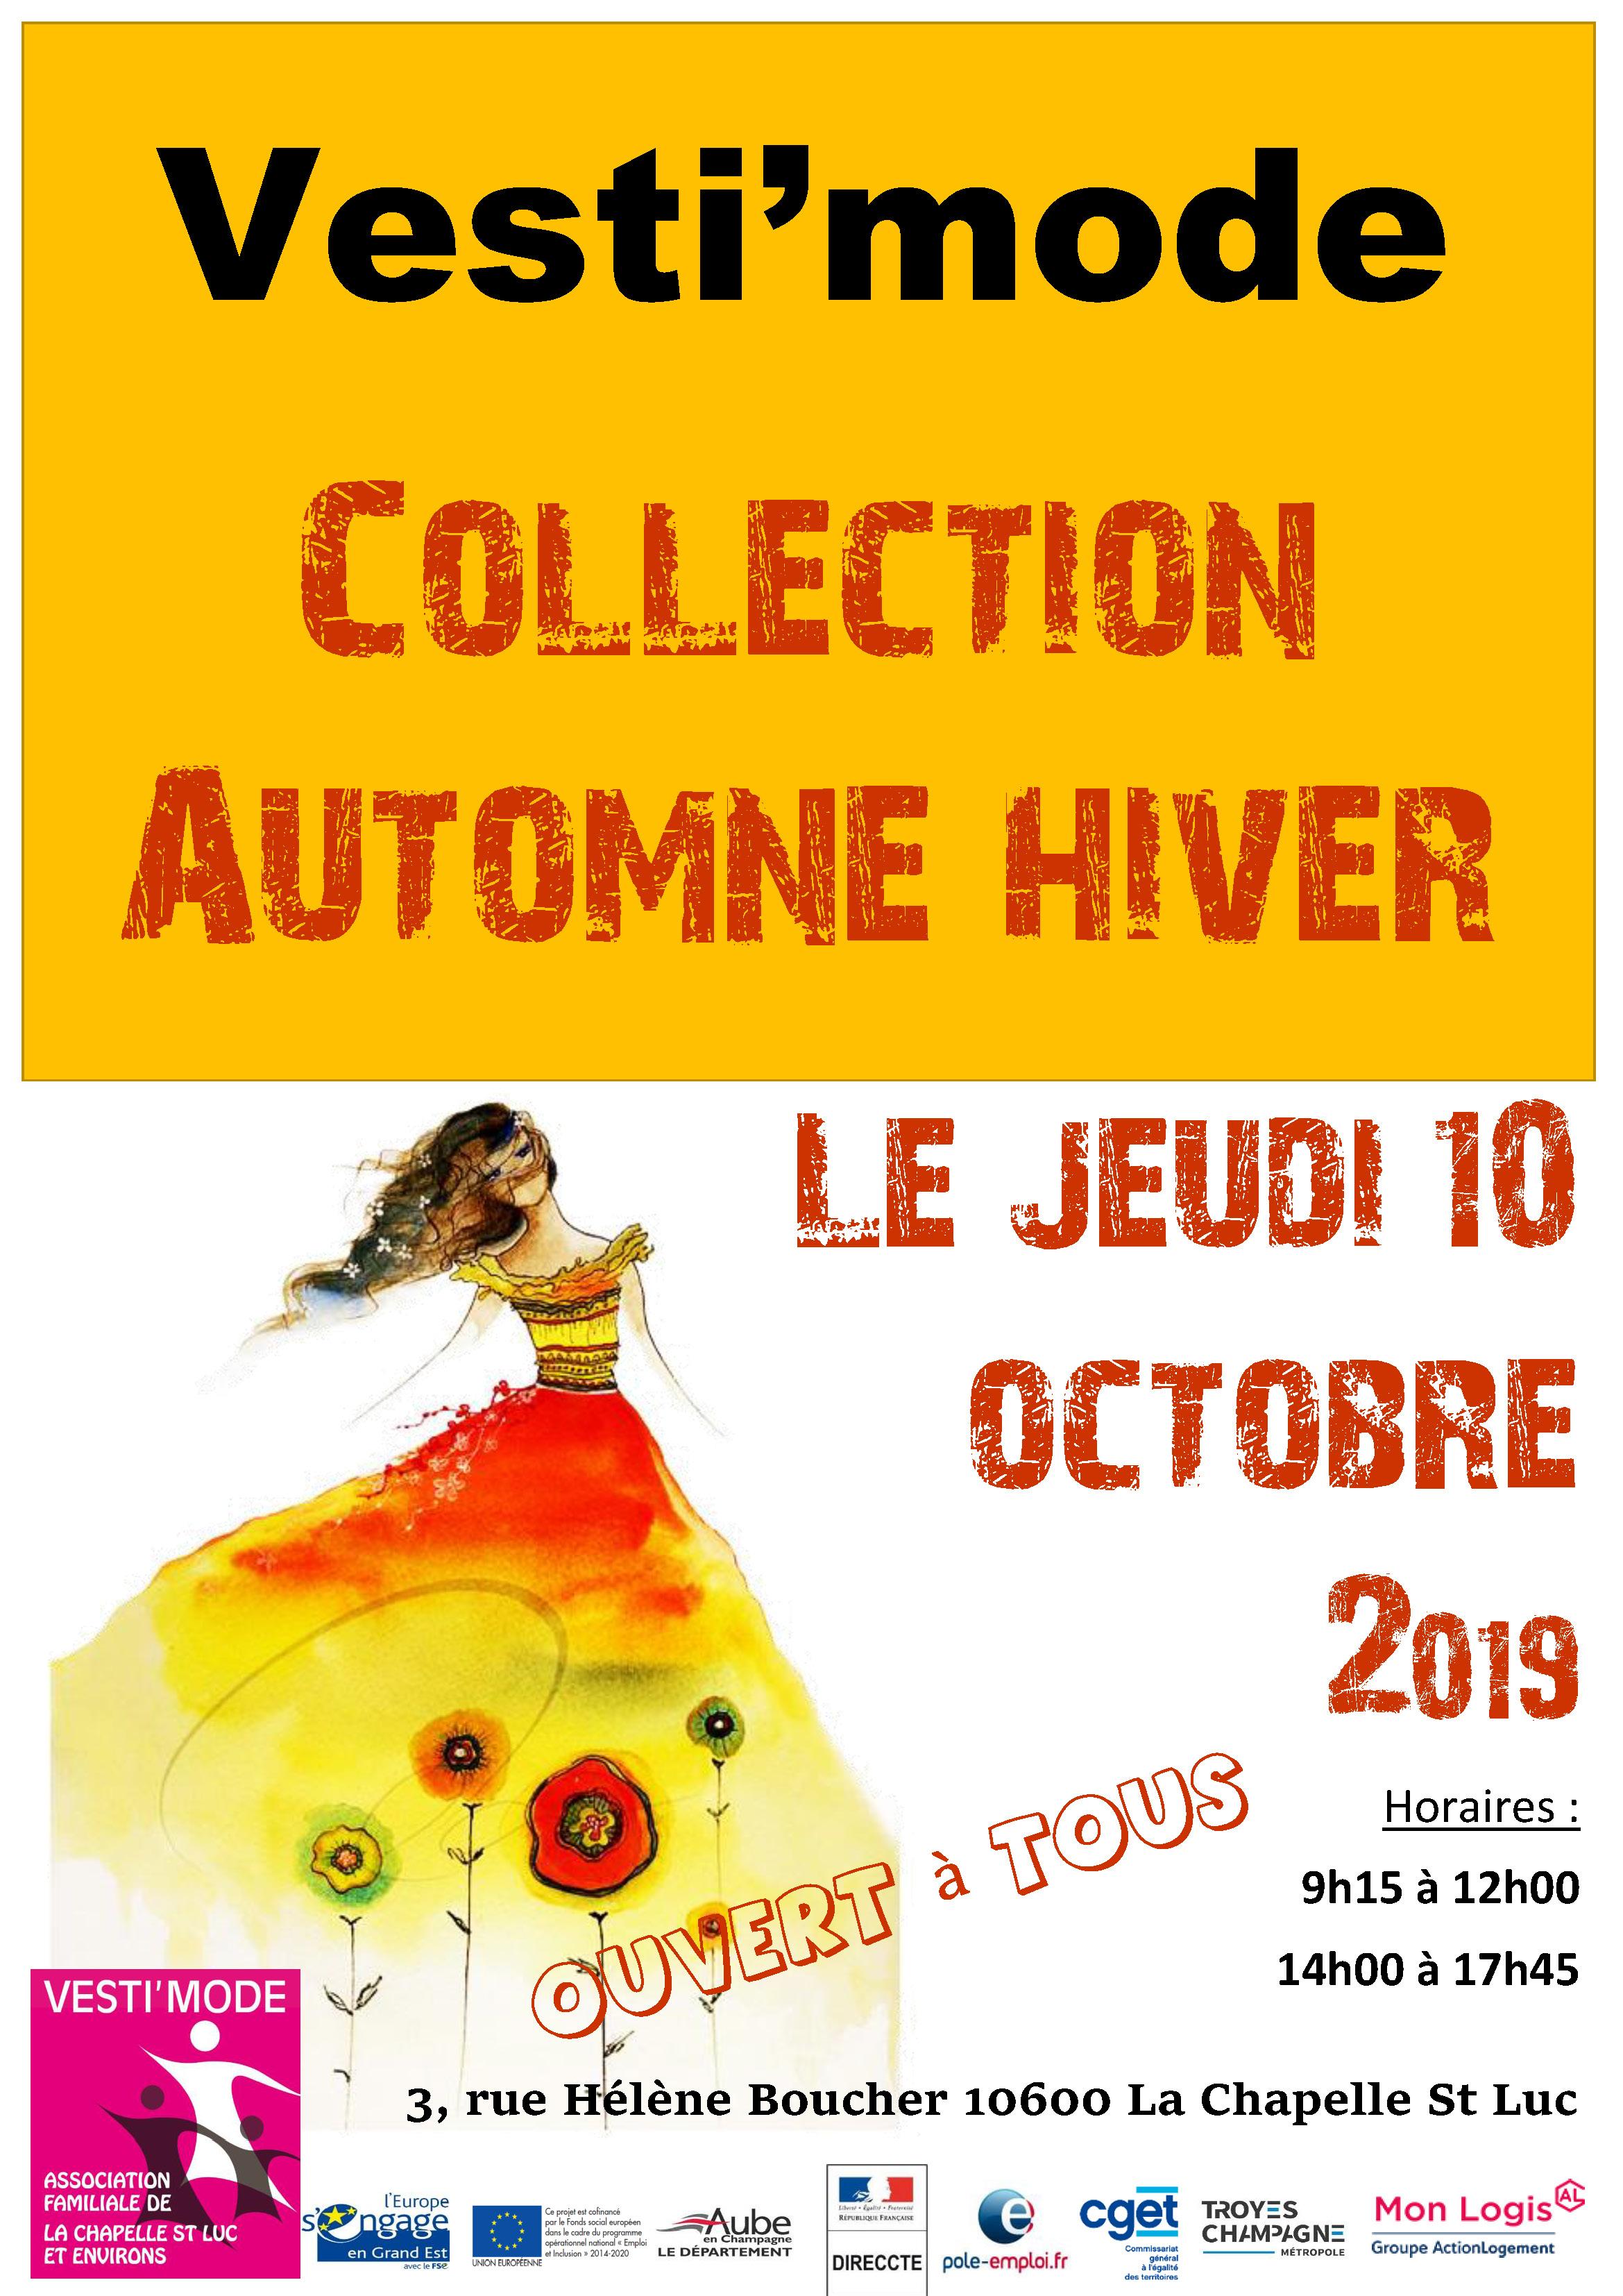 vente collection automne hiver